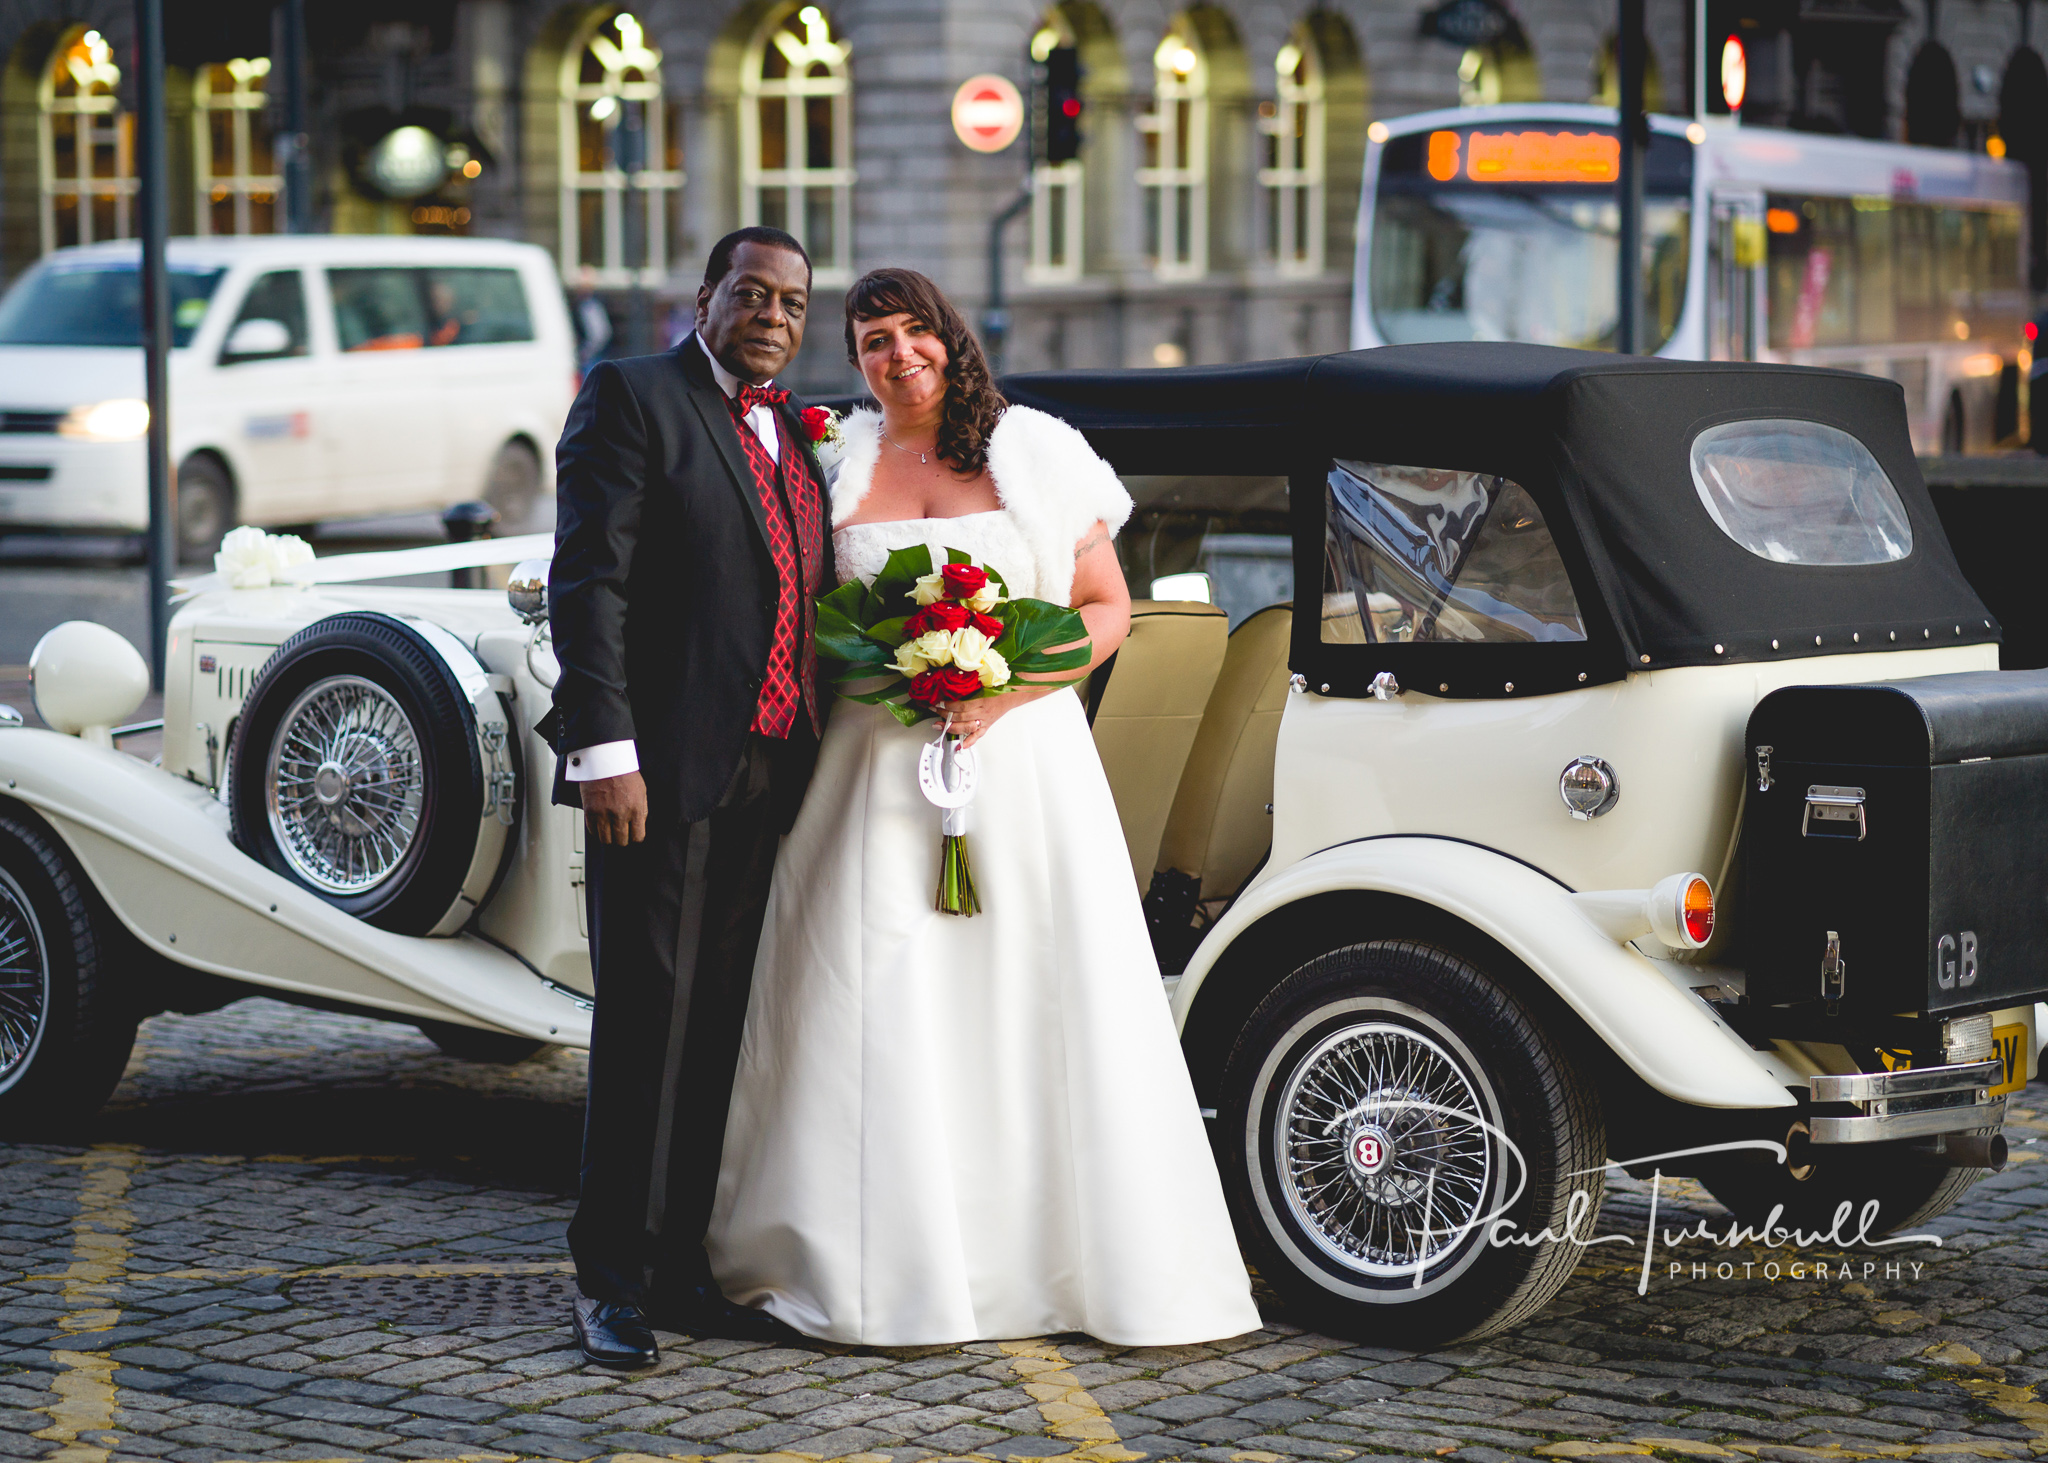 wedding-photographer-leeds-town-hall-030.jpg